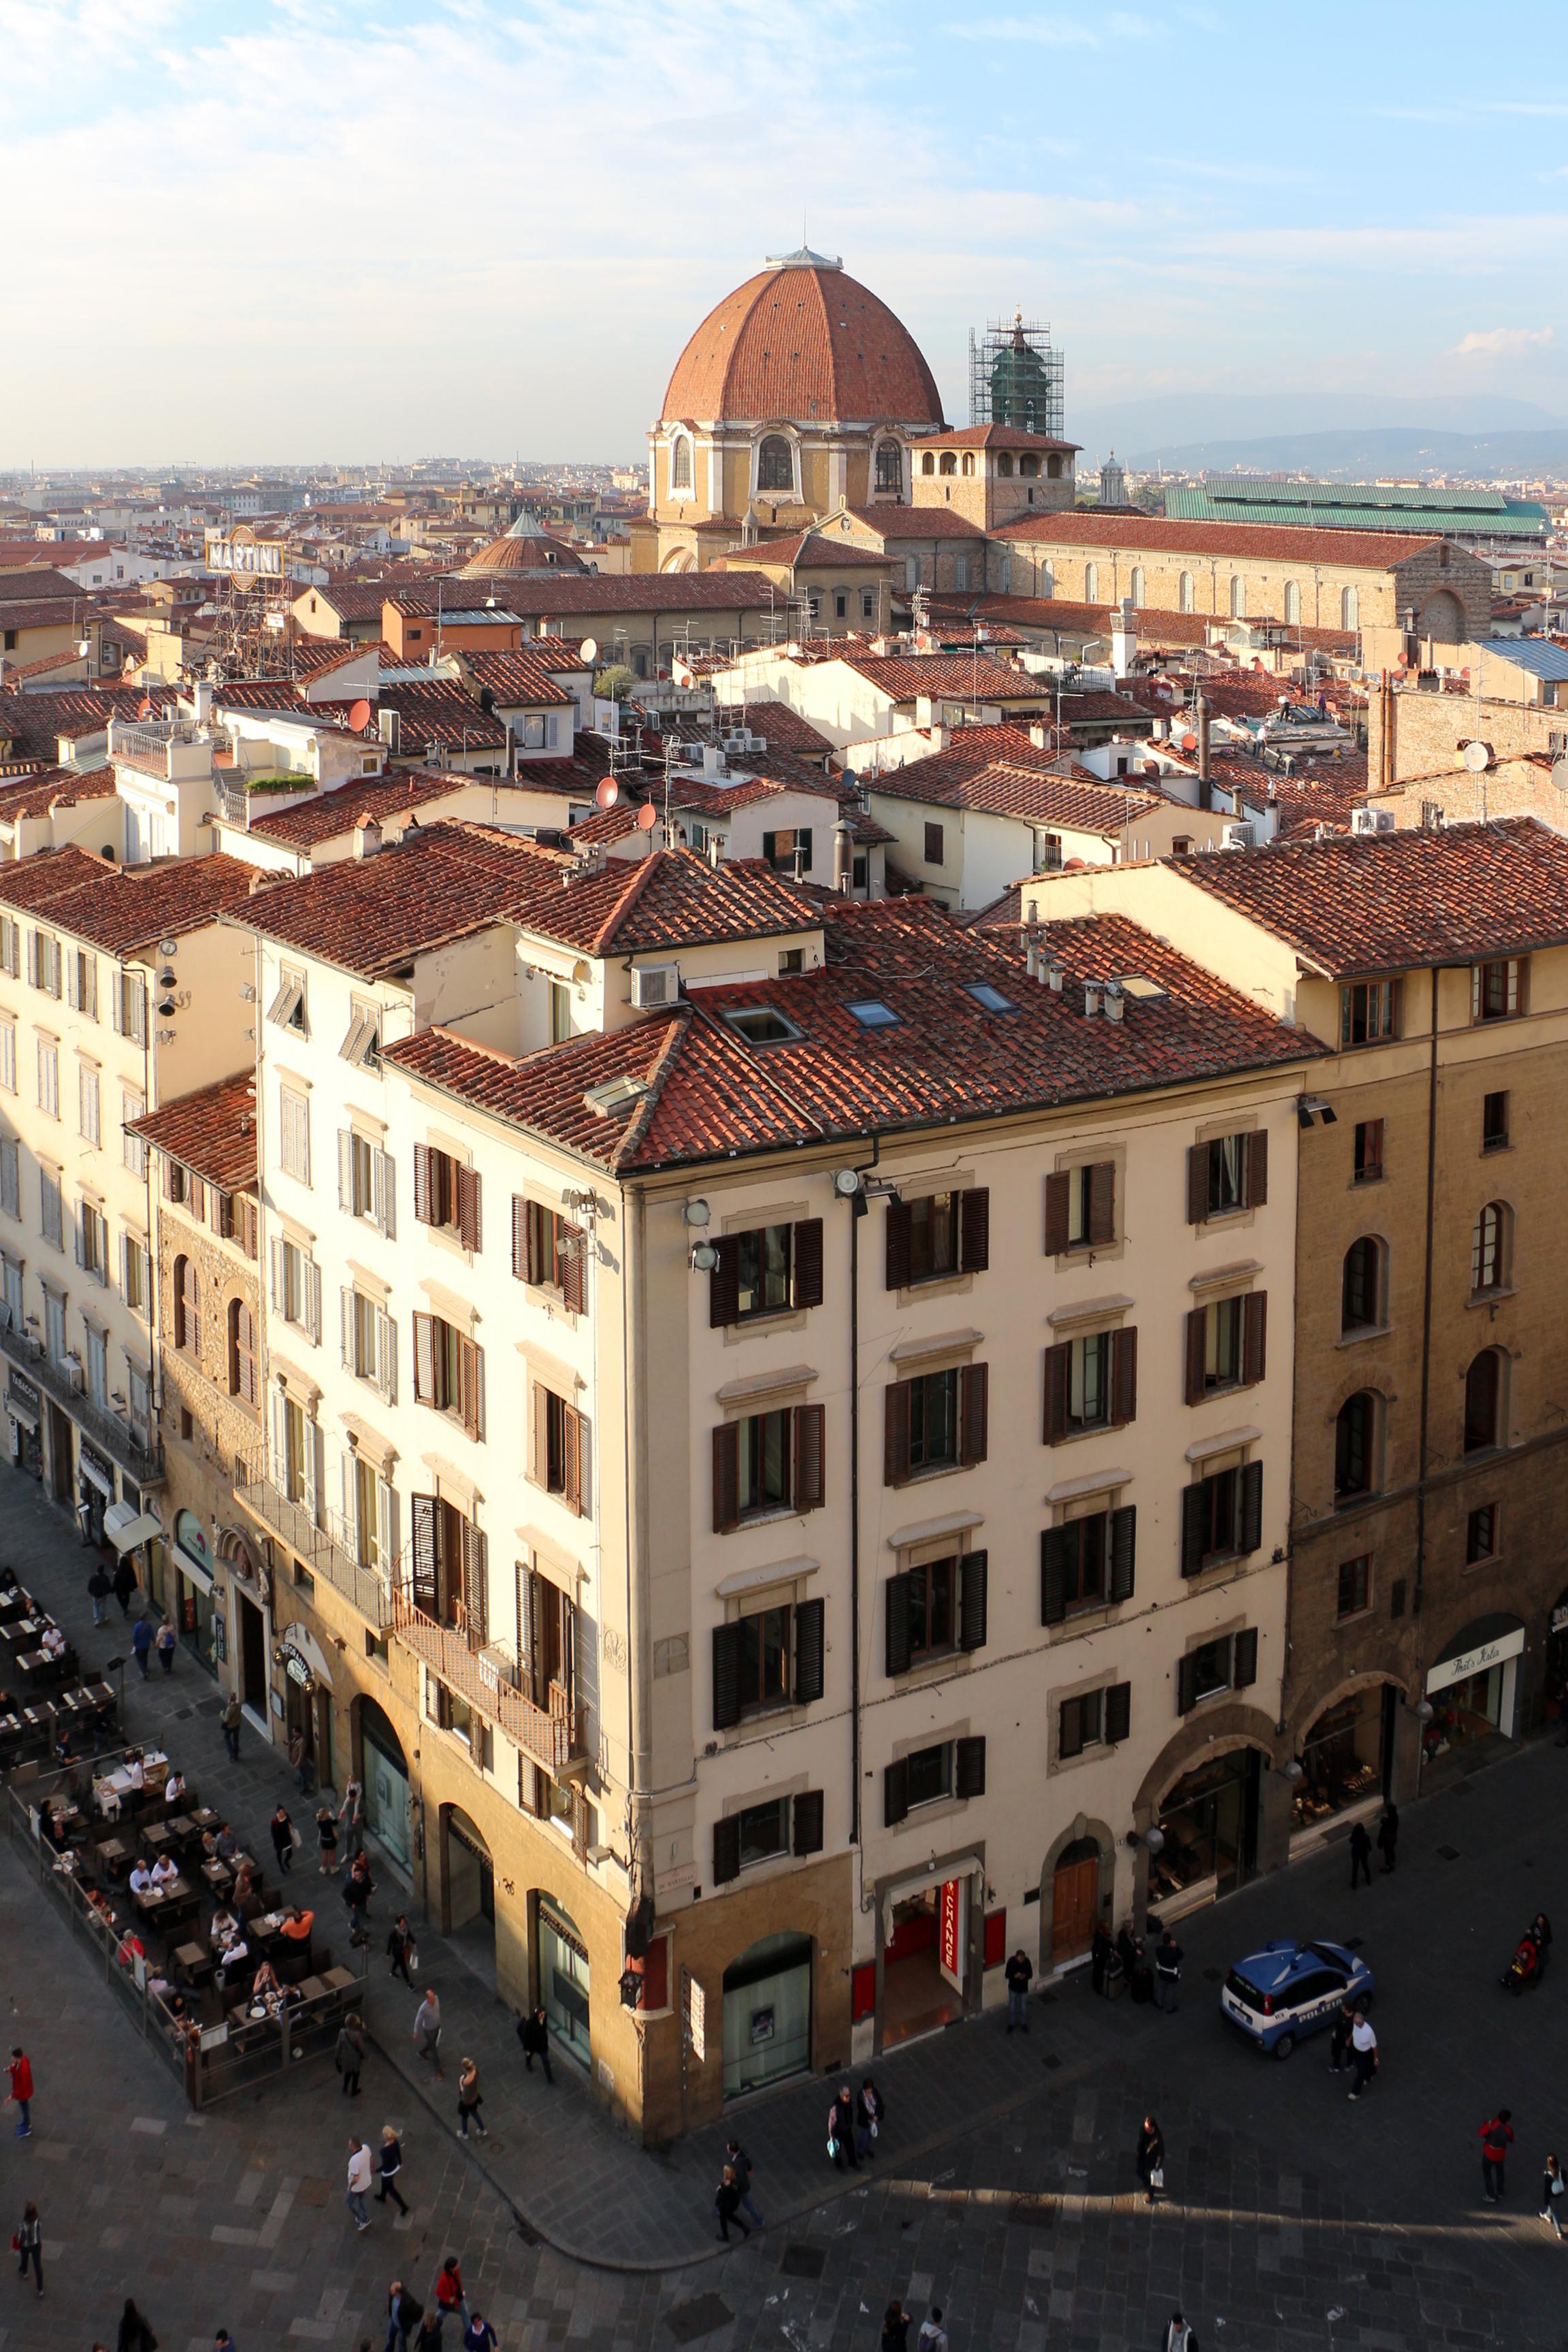 File:Terrazze del duomo, vedute su firenze, san lorenzo 03.JPG ...